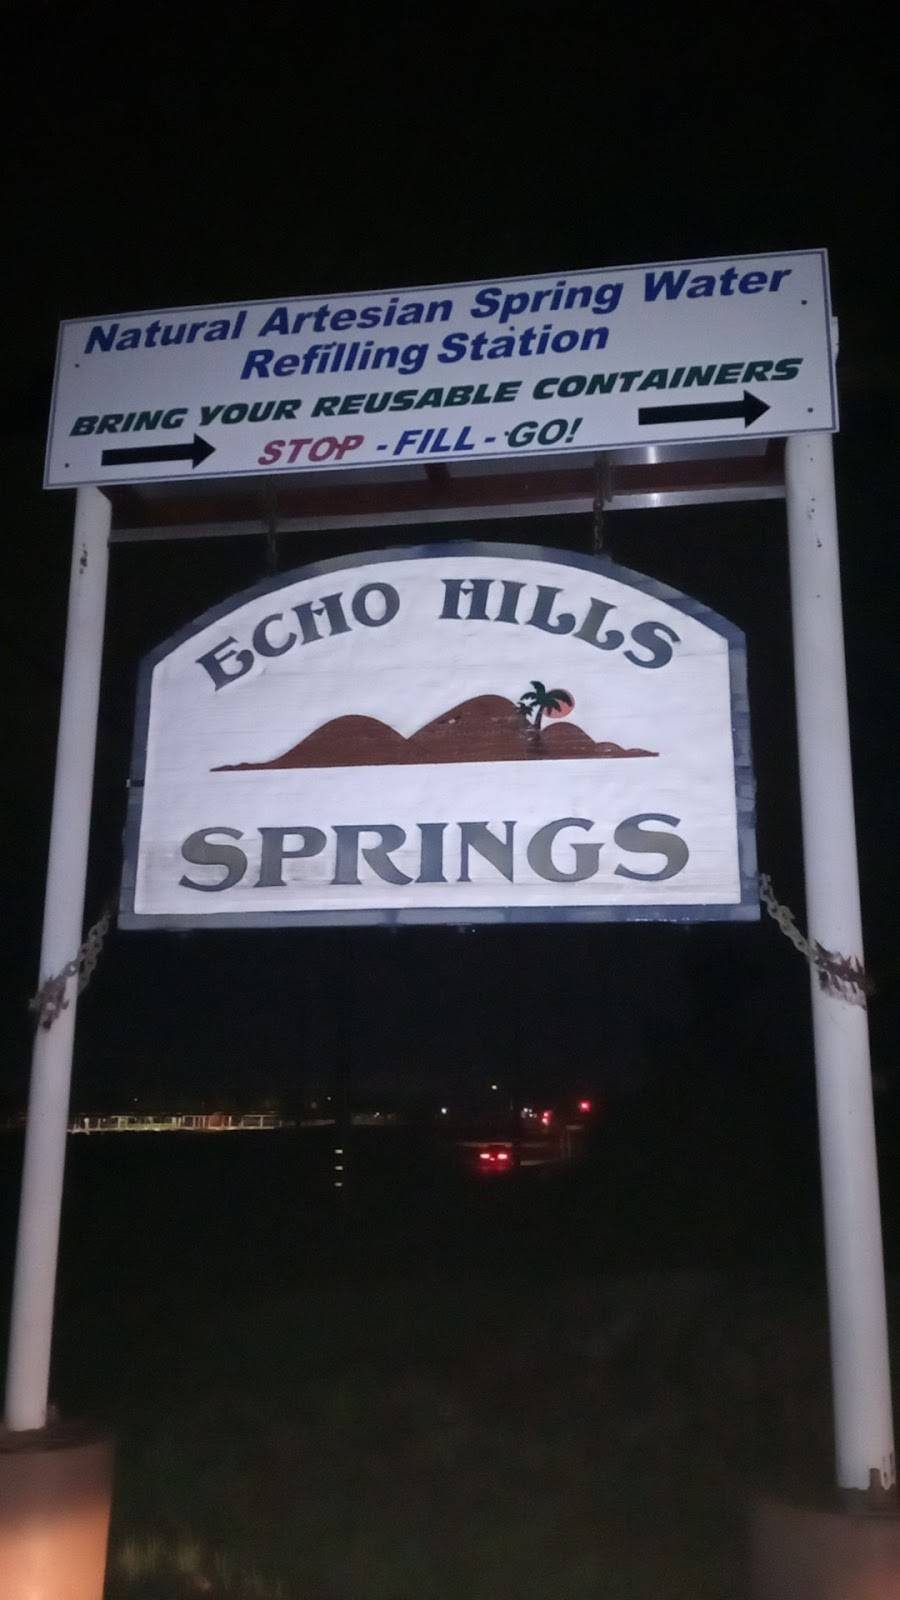 Echo Hills Natural Spring Water | restaurant | 1690 S State St, Hemet, CA 92543, USA